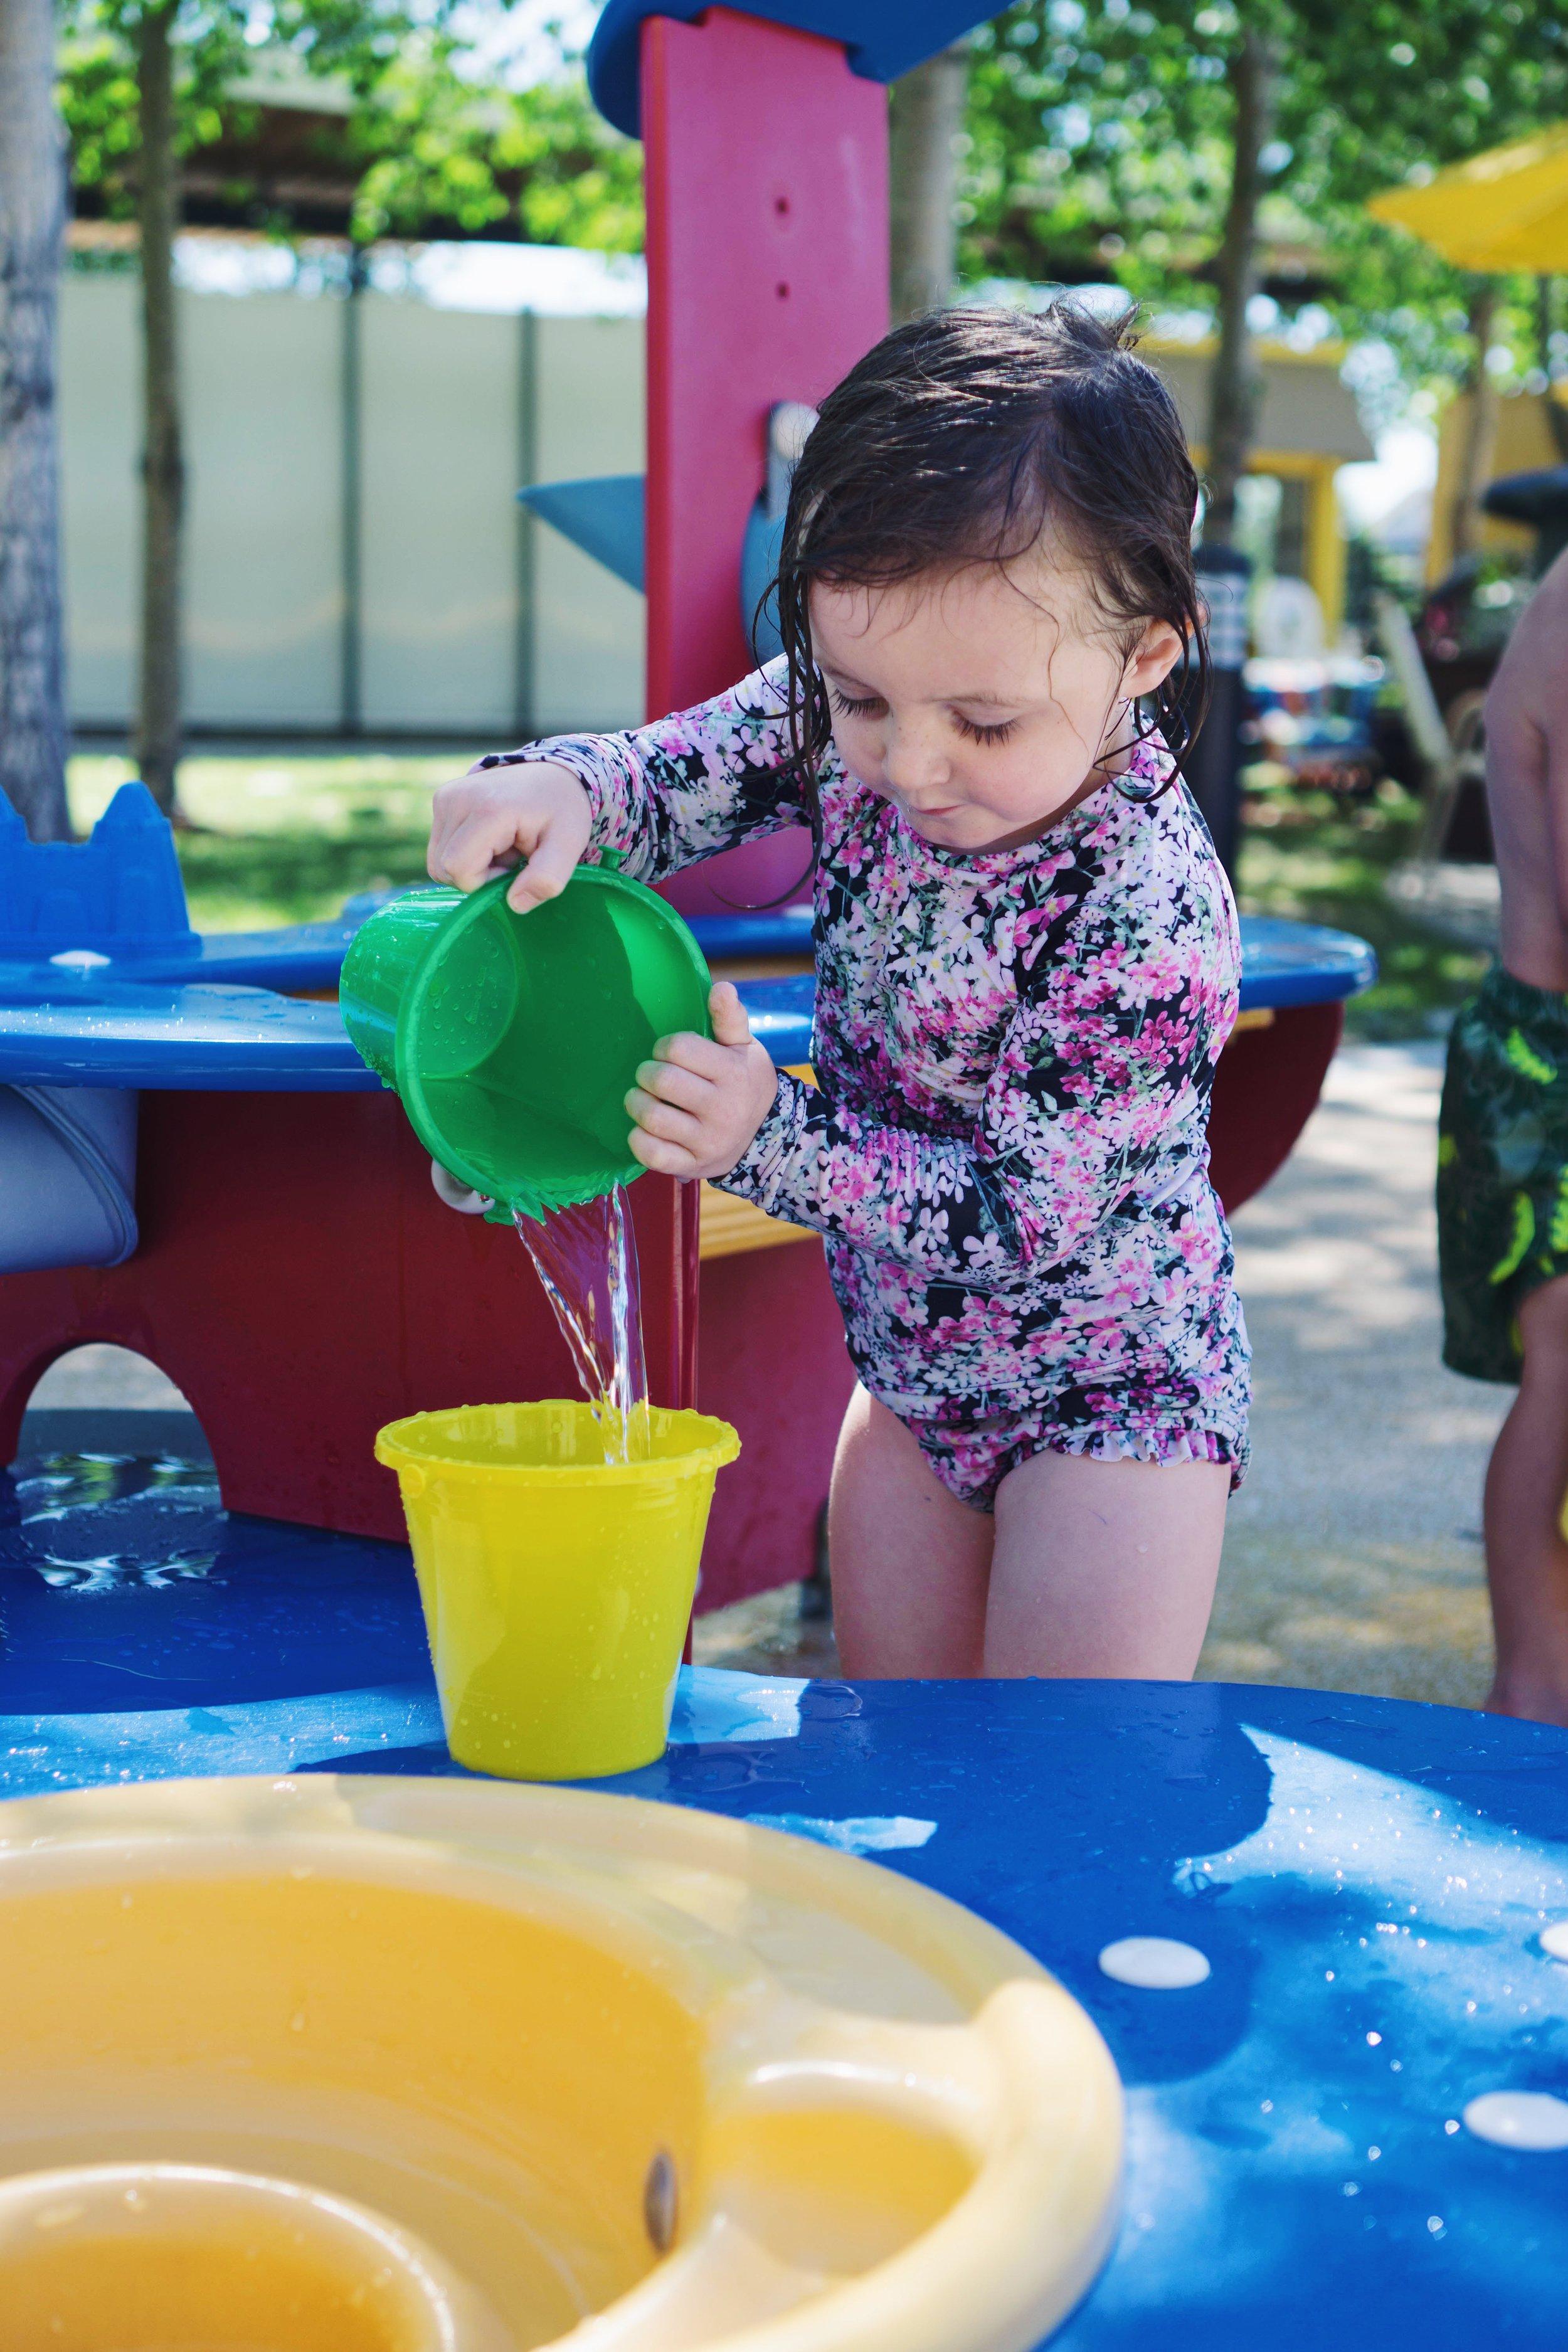 "<img src =""family-friendly-fun-in-denver-colorado.jpg"" alt =""fashion-bloggers-daughter-plays-at-a-local-pool-in-denver-colorado-sharing-family-friendly-fun-in-denver"">"